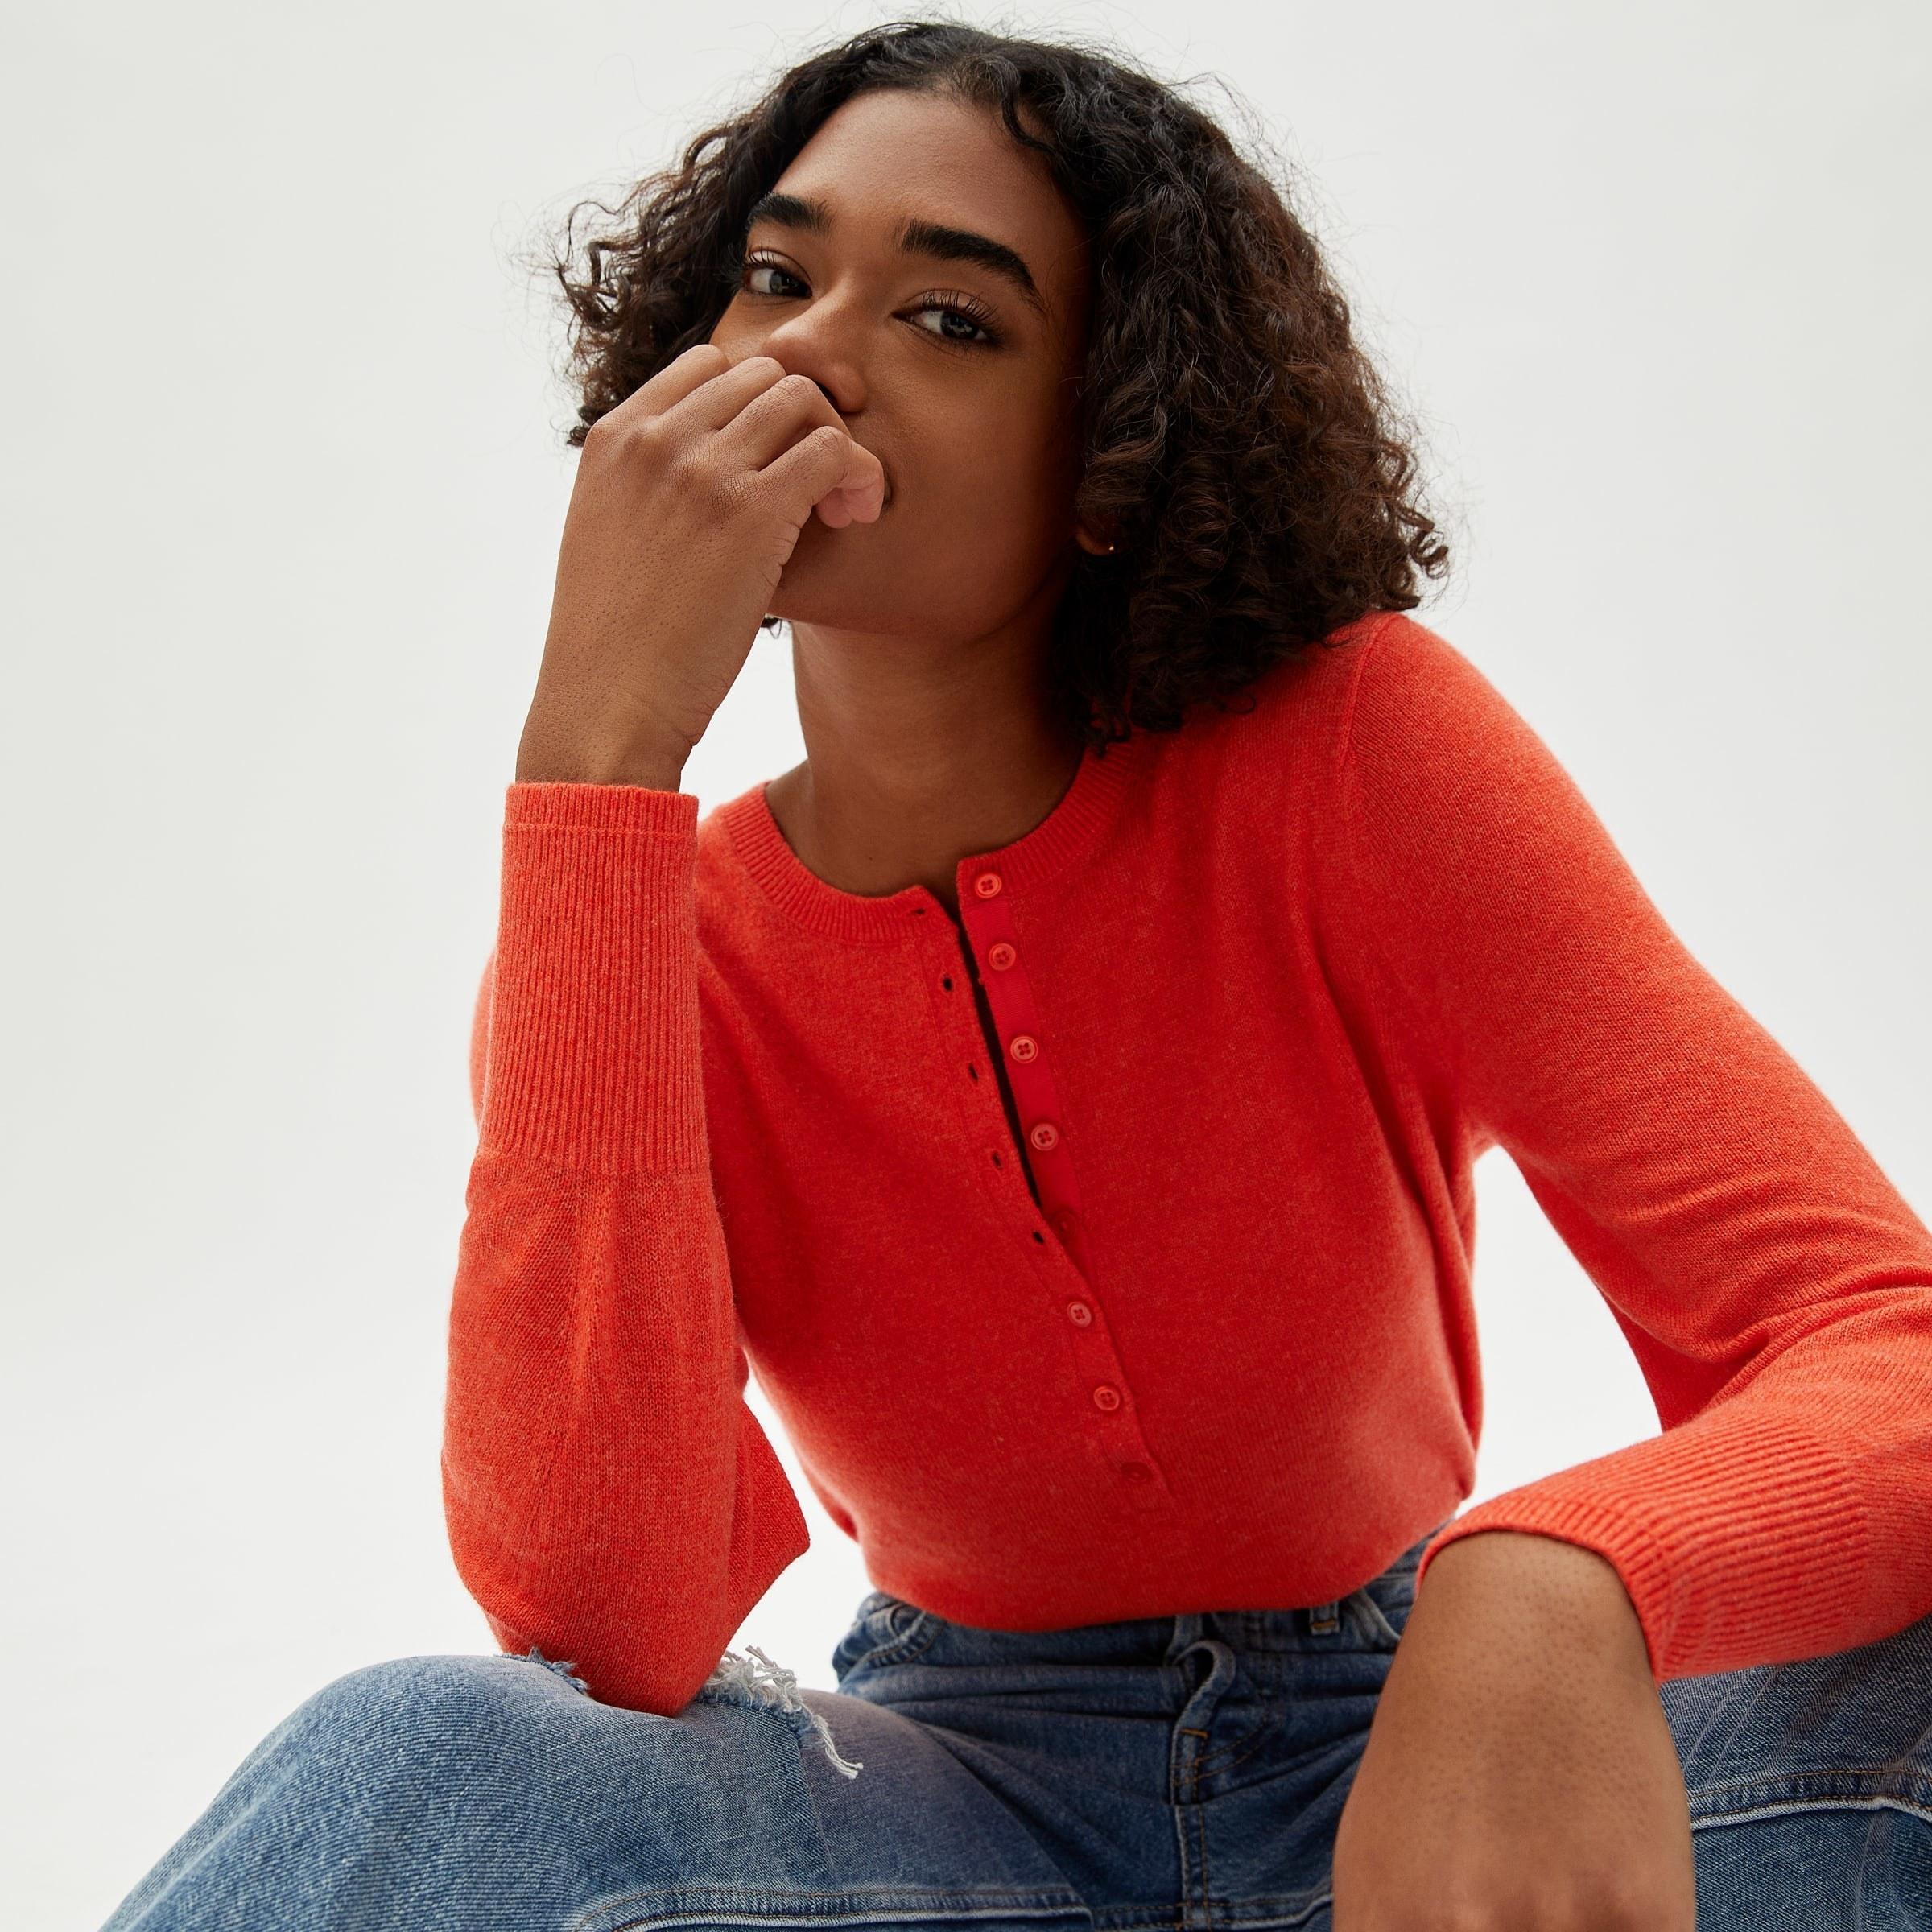 Model in the red-orange henley